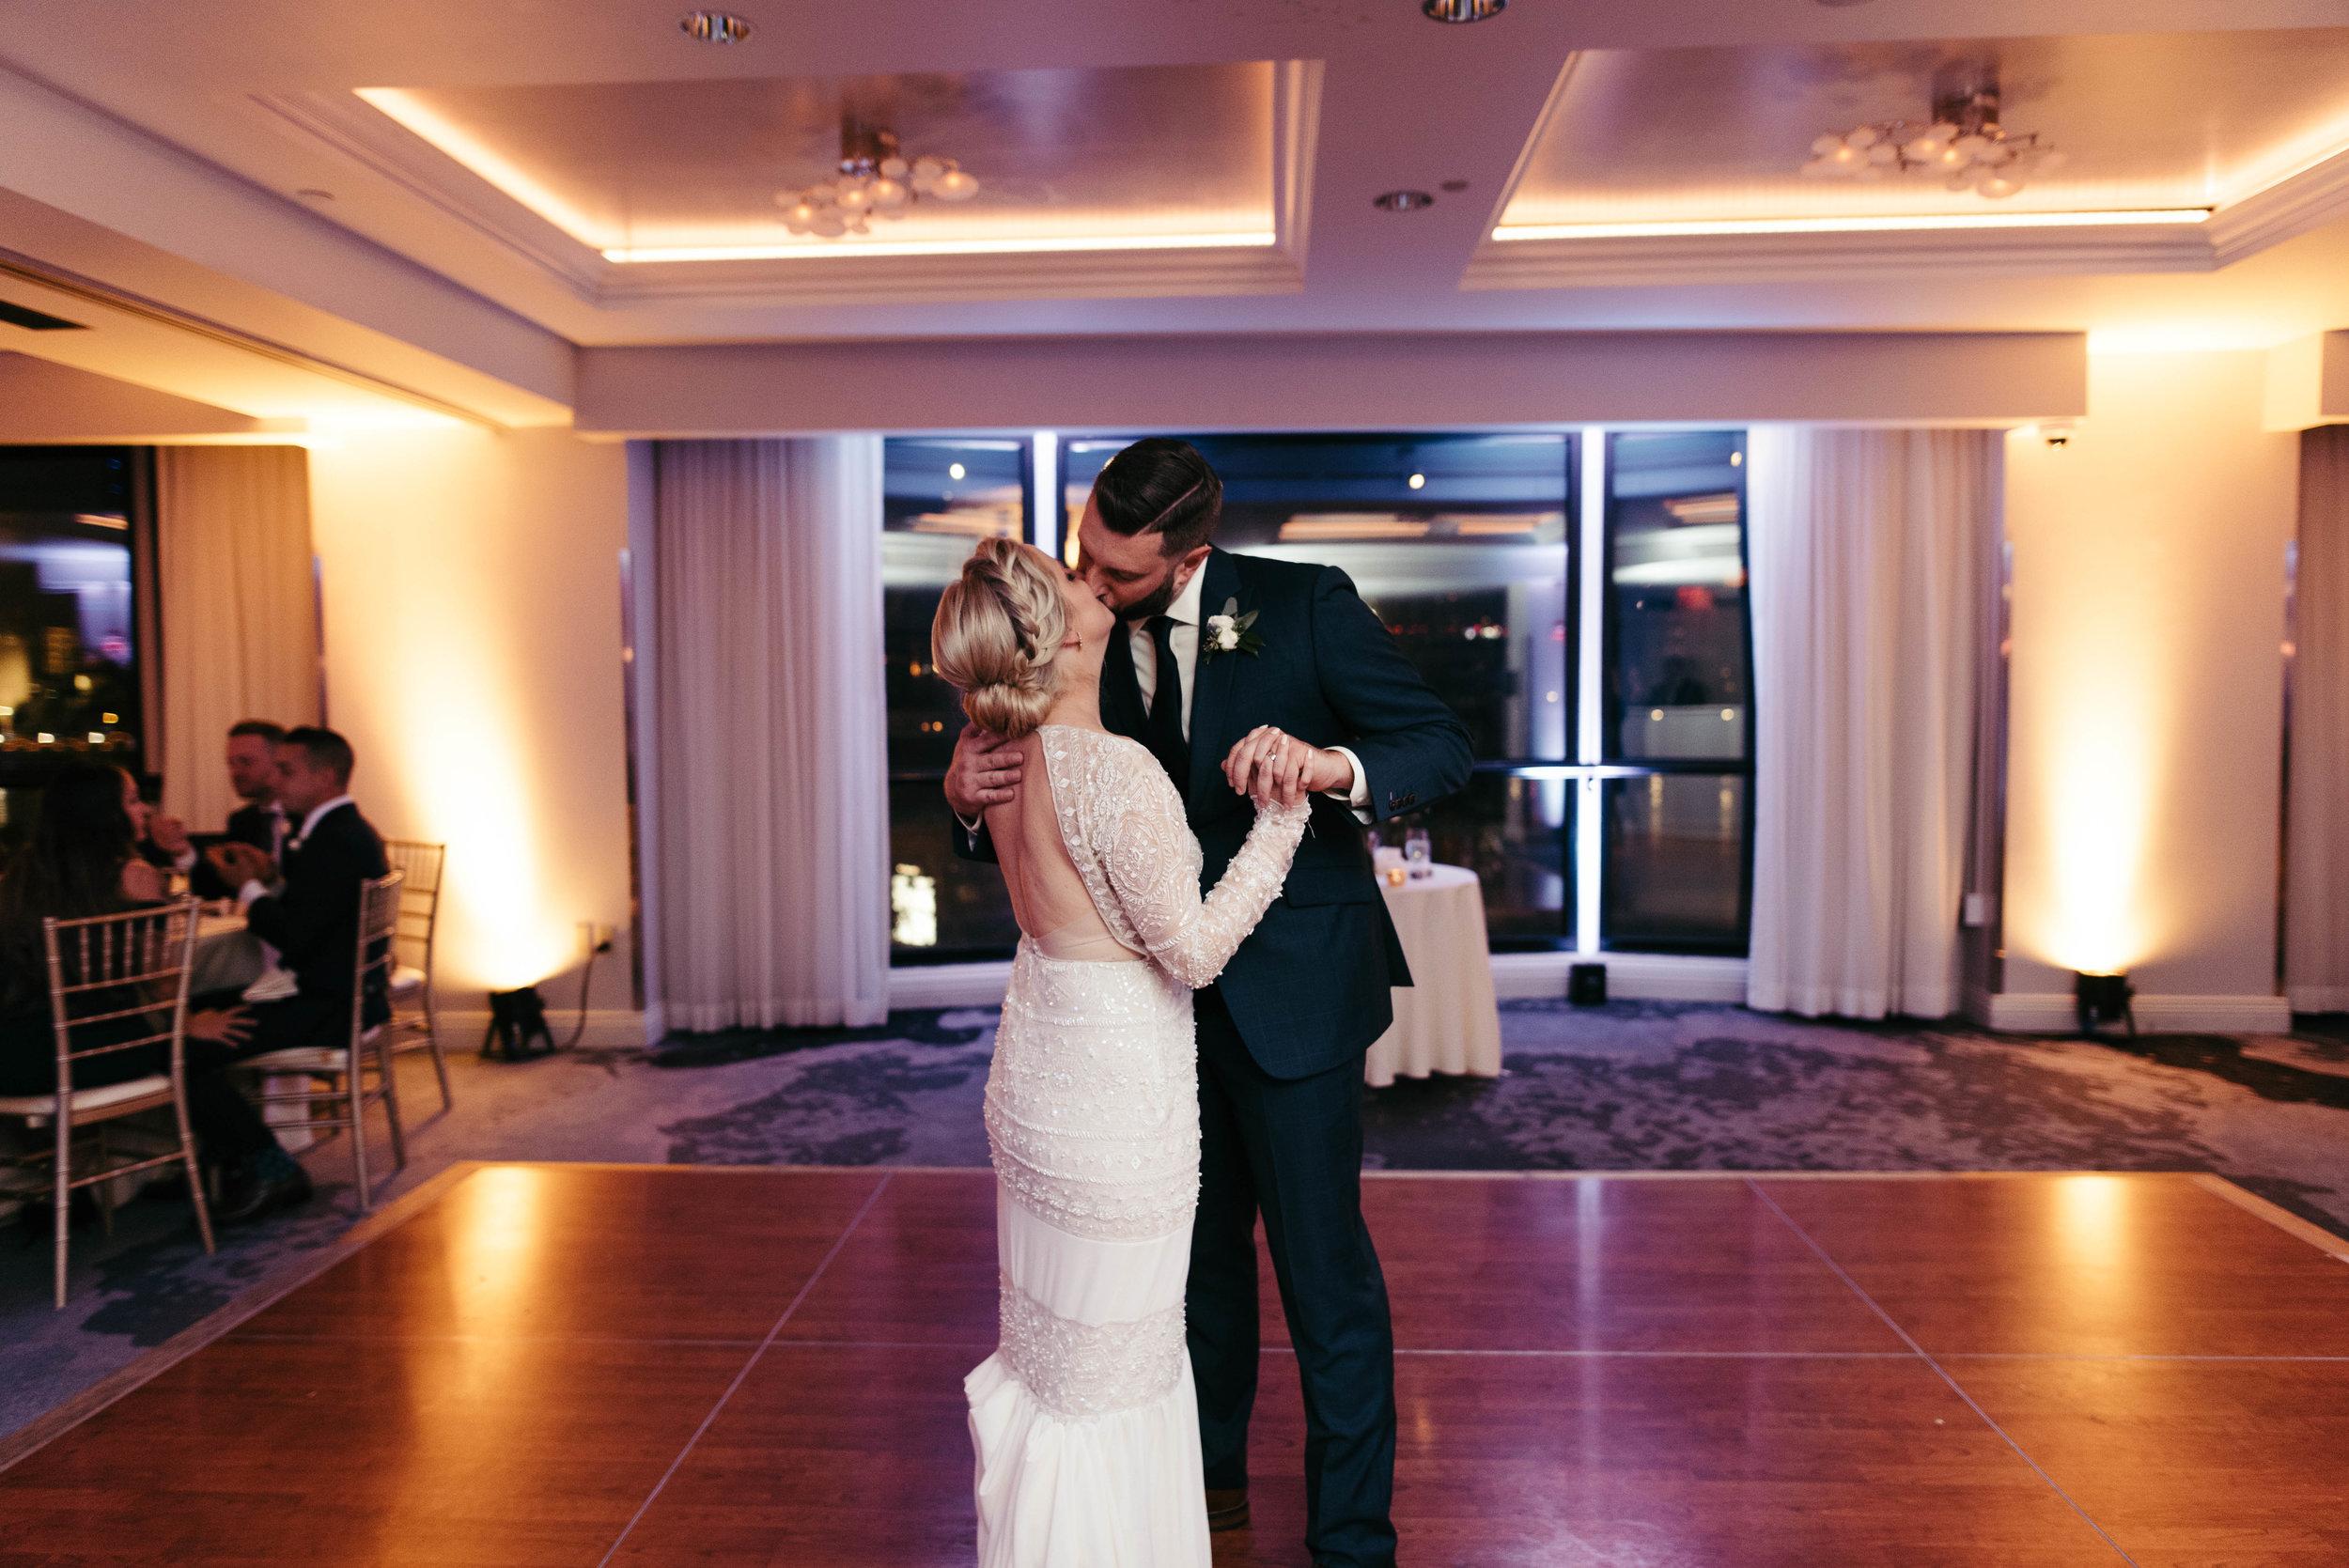 renaissance hotel wedding photos-53.jpg